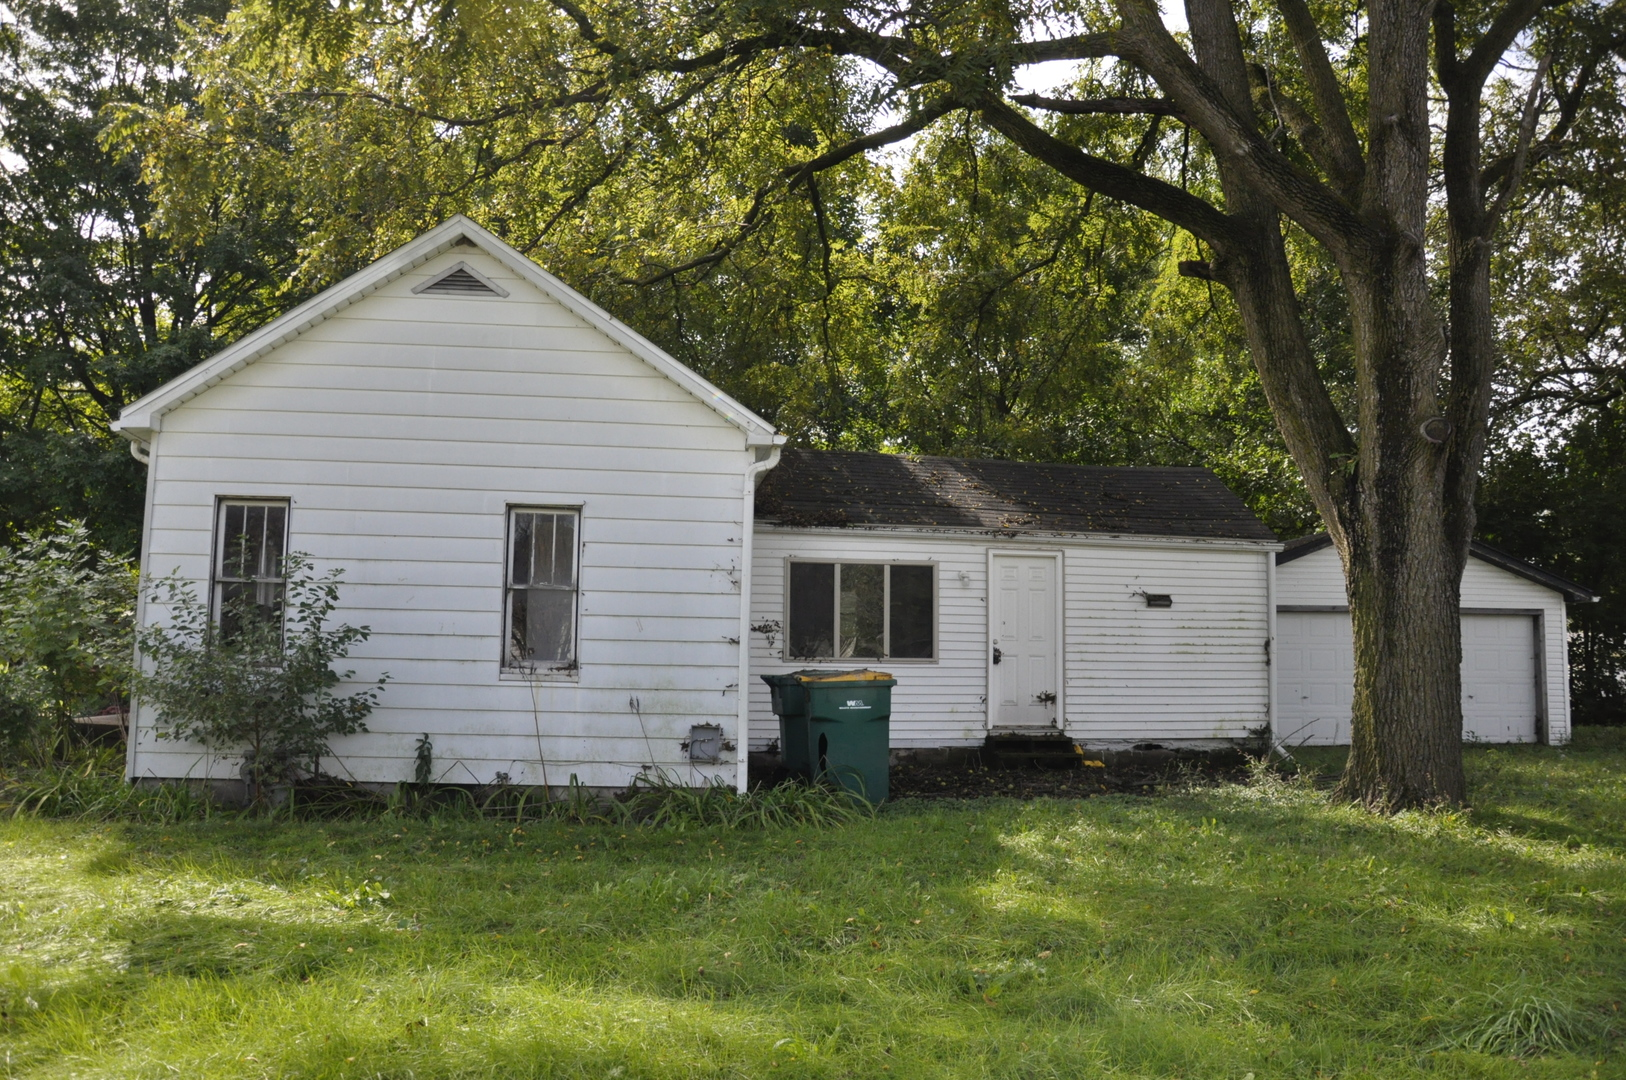 912 North Everett, Streator, Illinois, 61364